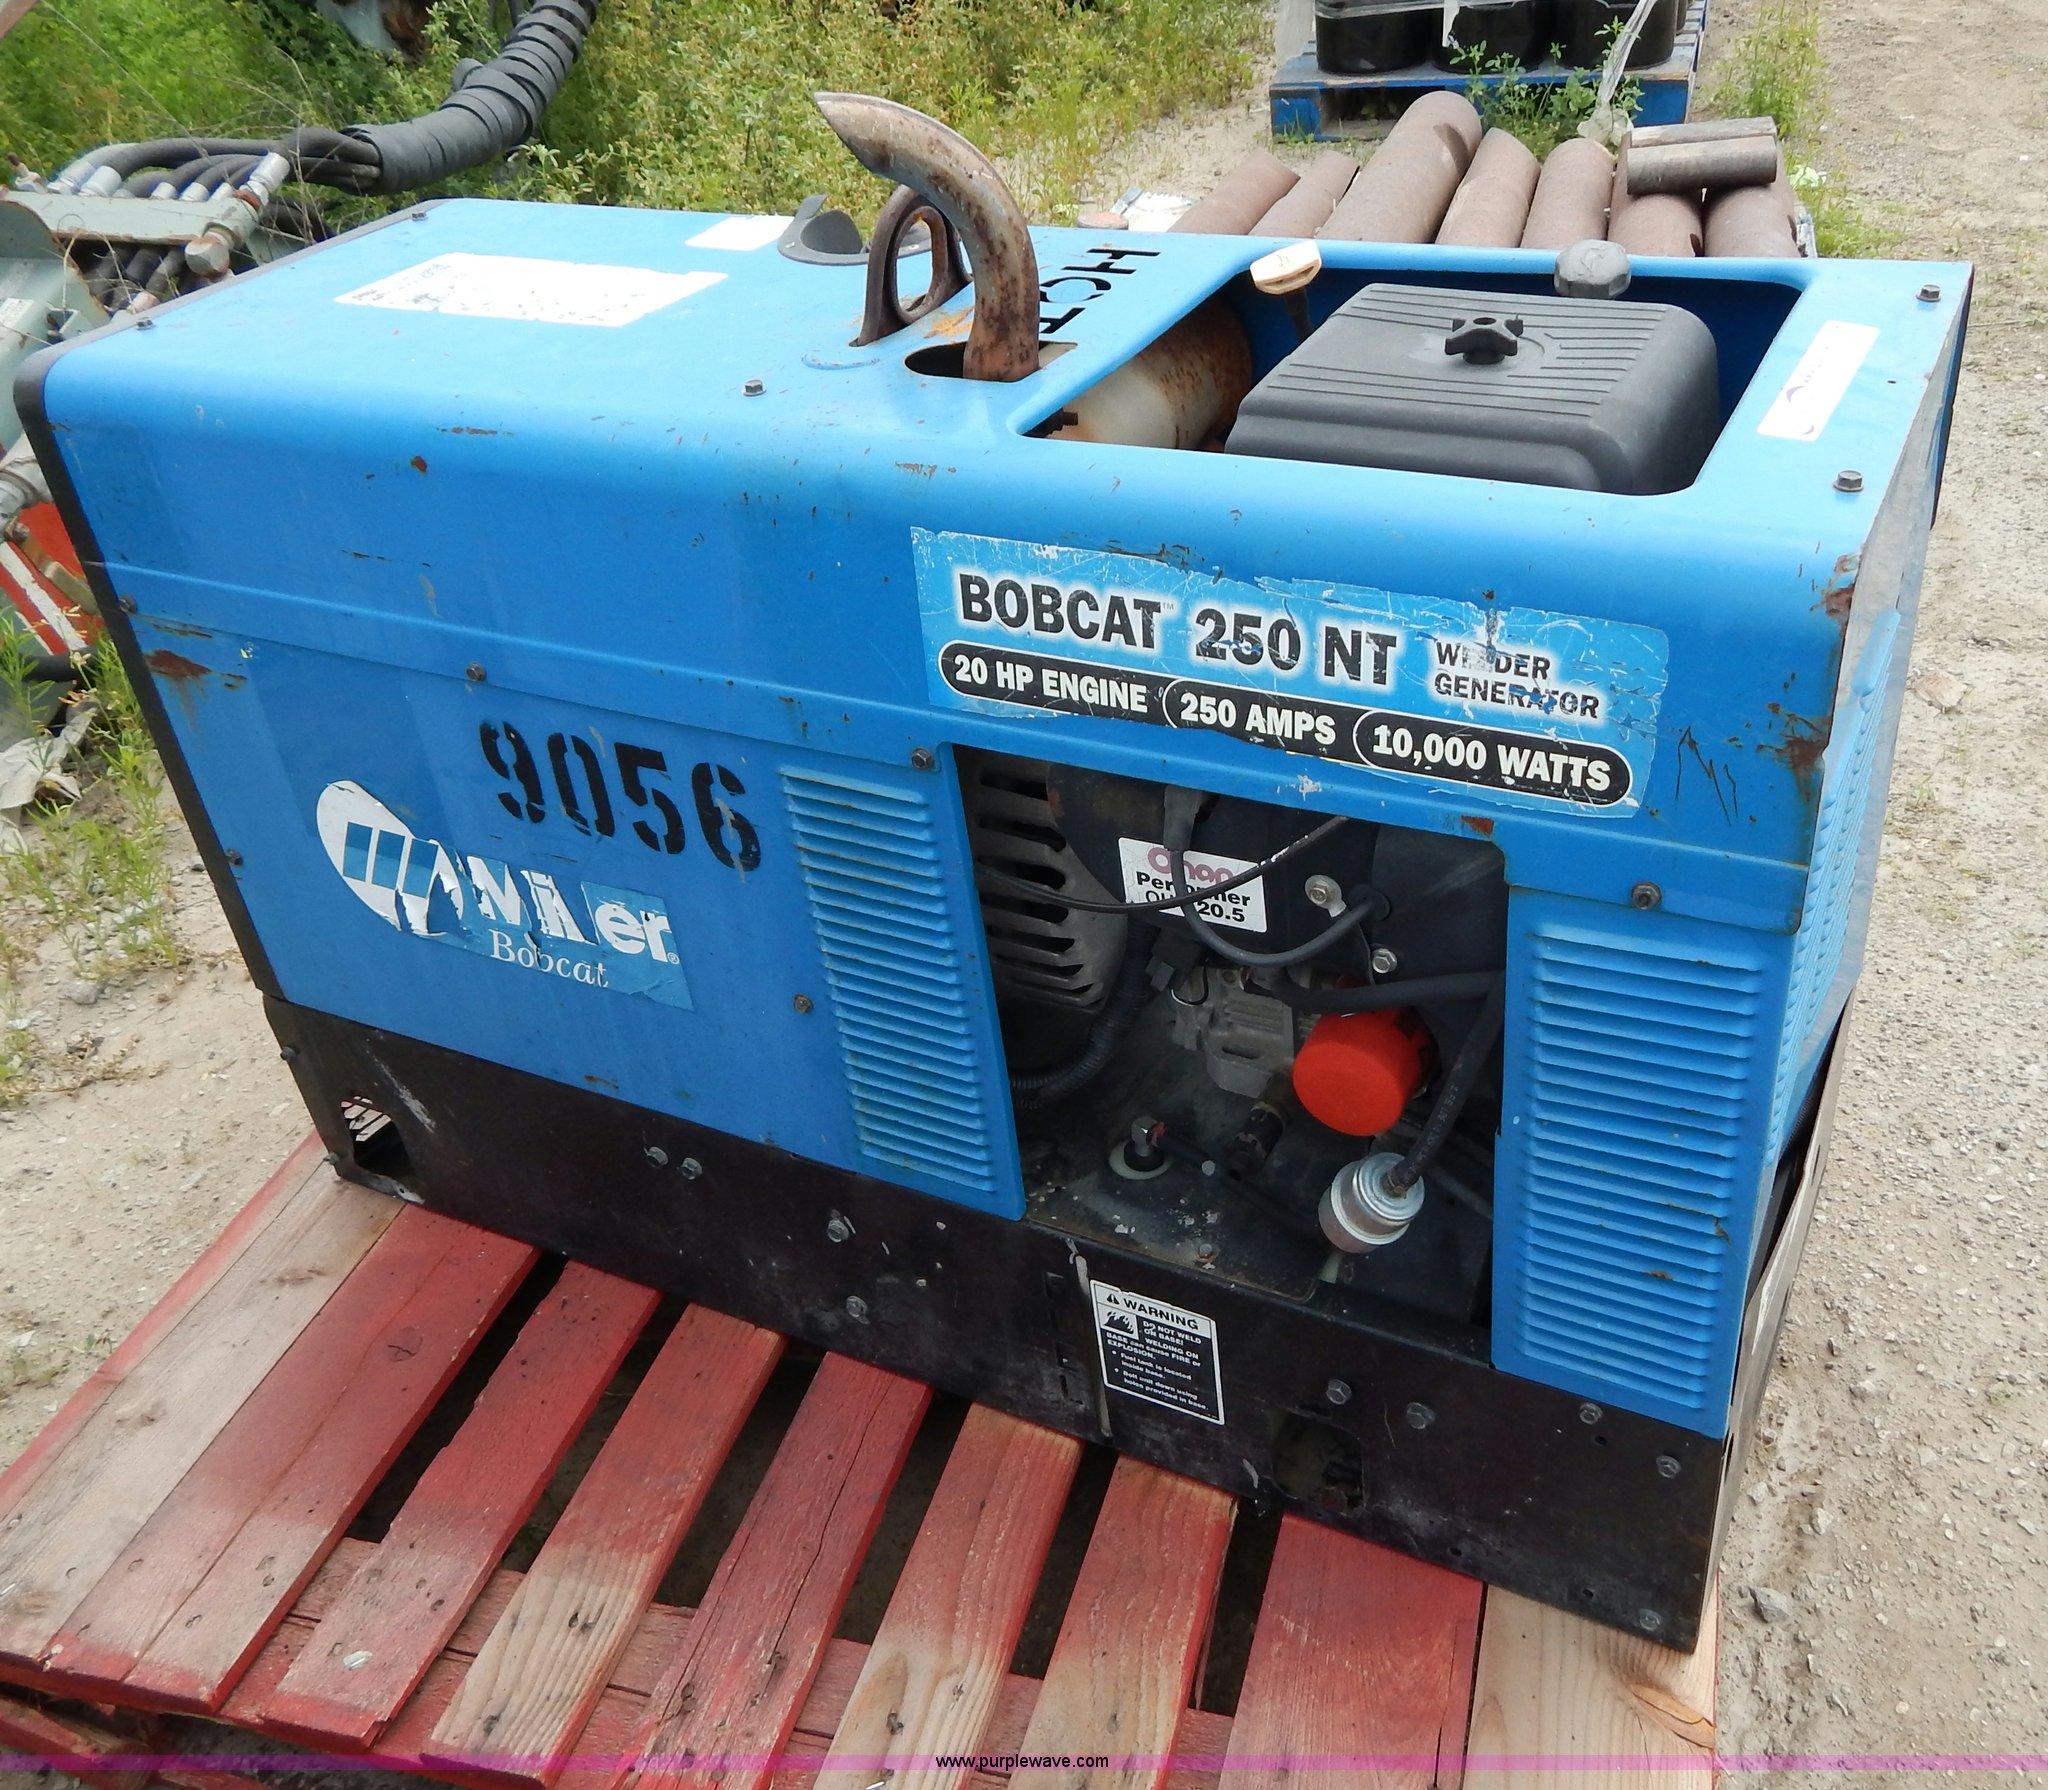 Miller Bobcat 250 Nt Manual Wiring Diagram 250nt Welder Generator Item Ae9821 Sold J Rh Purplewave Com 225 Parts